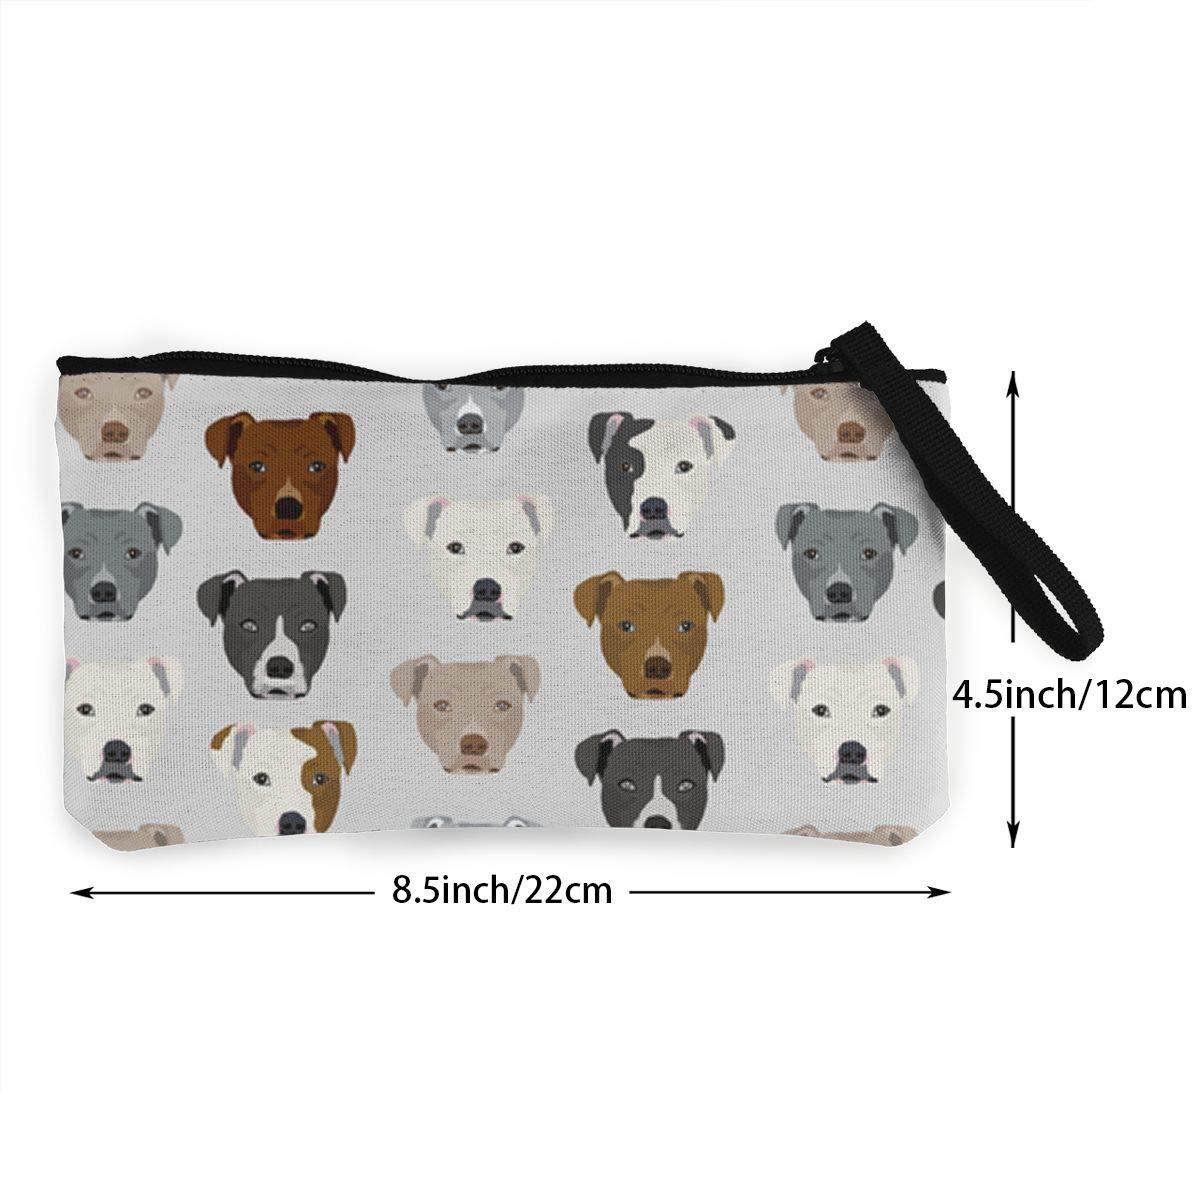 DH14hjsdDEE Pitbull Heads zipper canvas coin purse wallet Make Up Bag Cellphone Bag With Handle